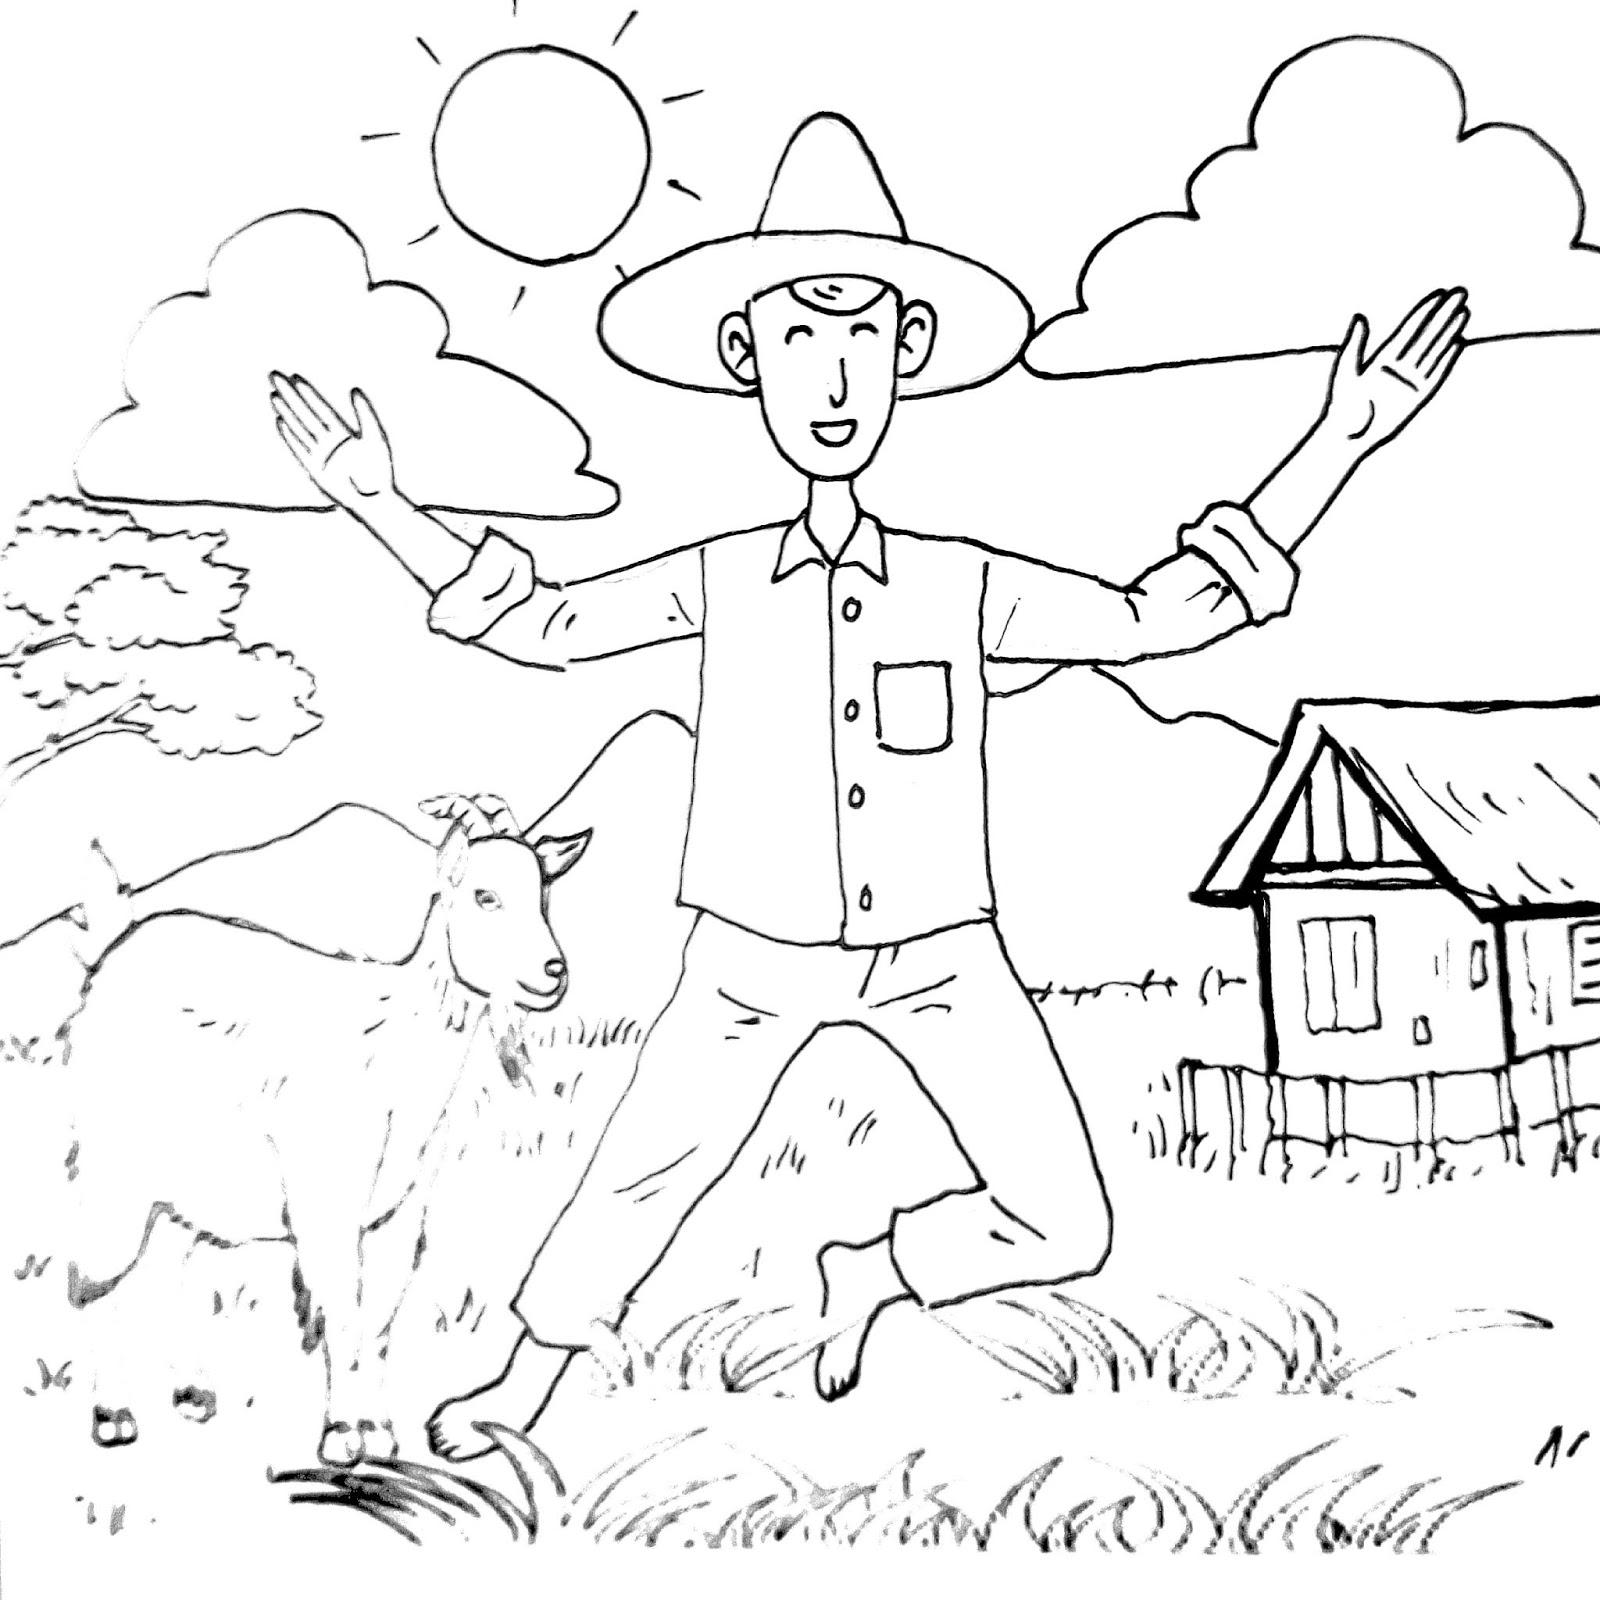 Karikaturkuindonesia Beternak merupakan salah satu kegiatan yang menyenangkan Beternak merupakan suatu hobby yang sebagian orang memandang